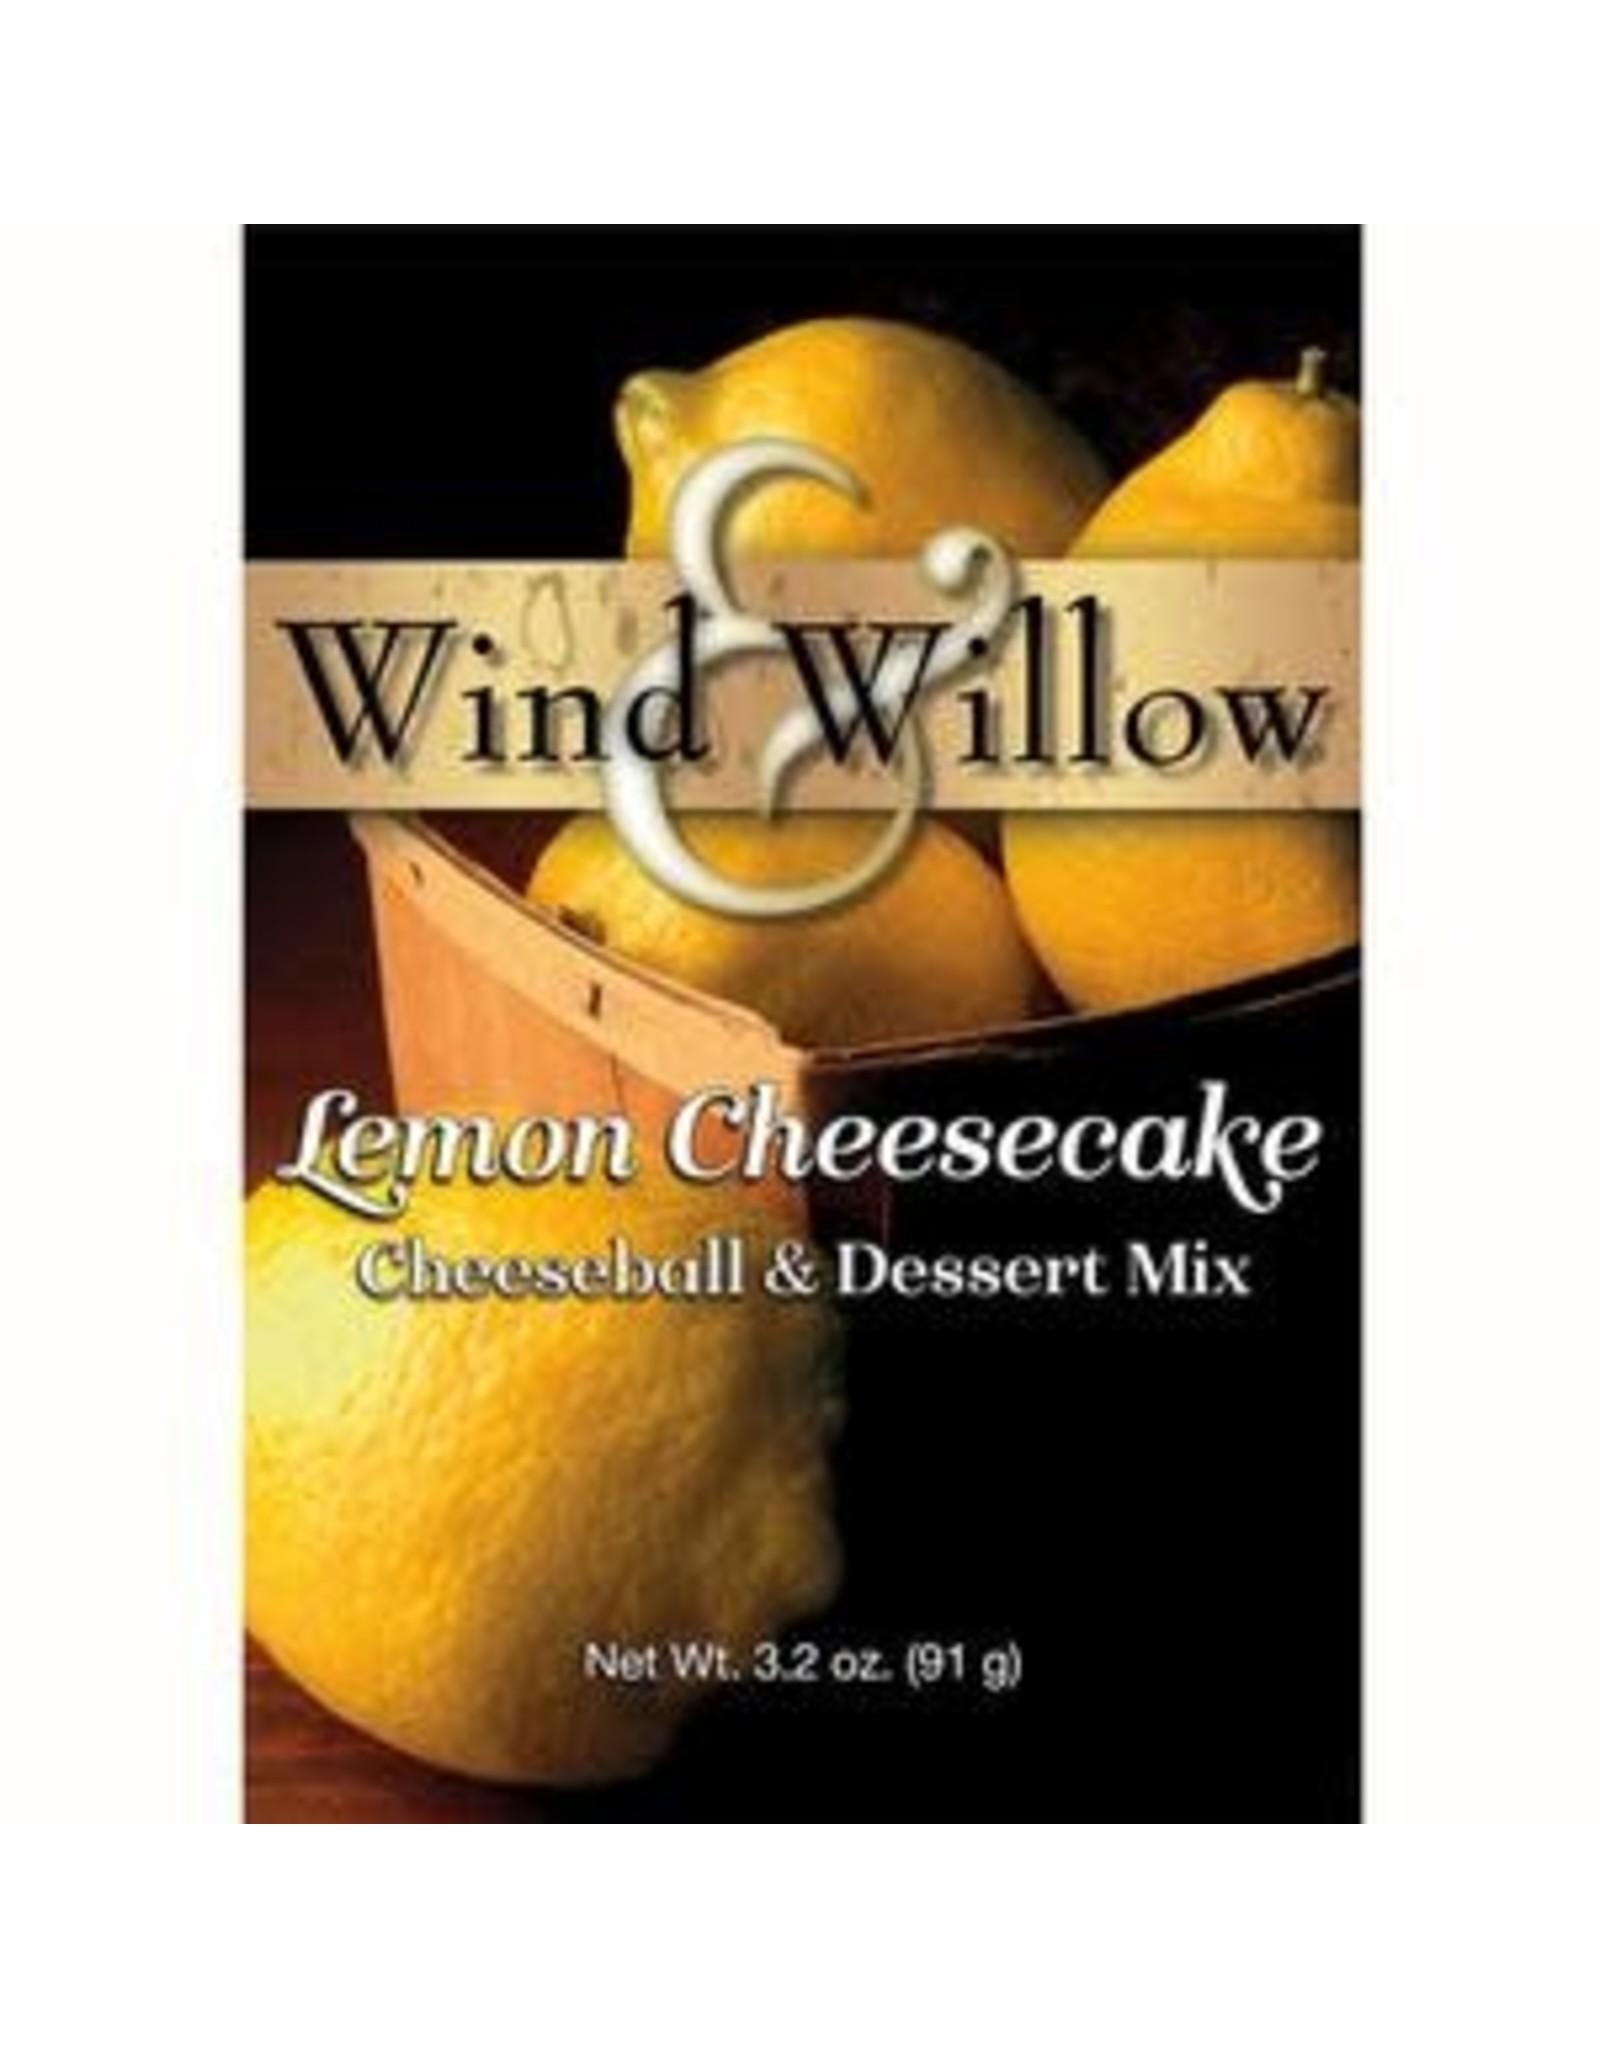 Wind & Willow Lemon Cheesecake Dessert Mix, 3.2oz